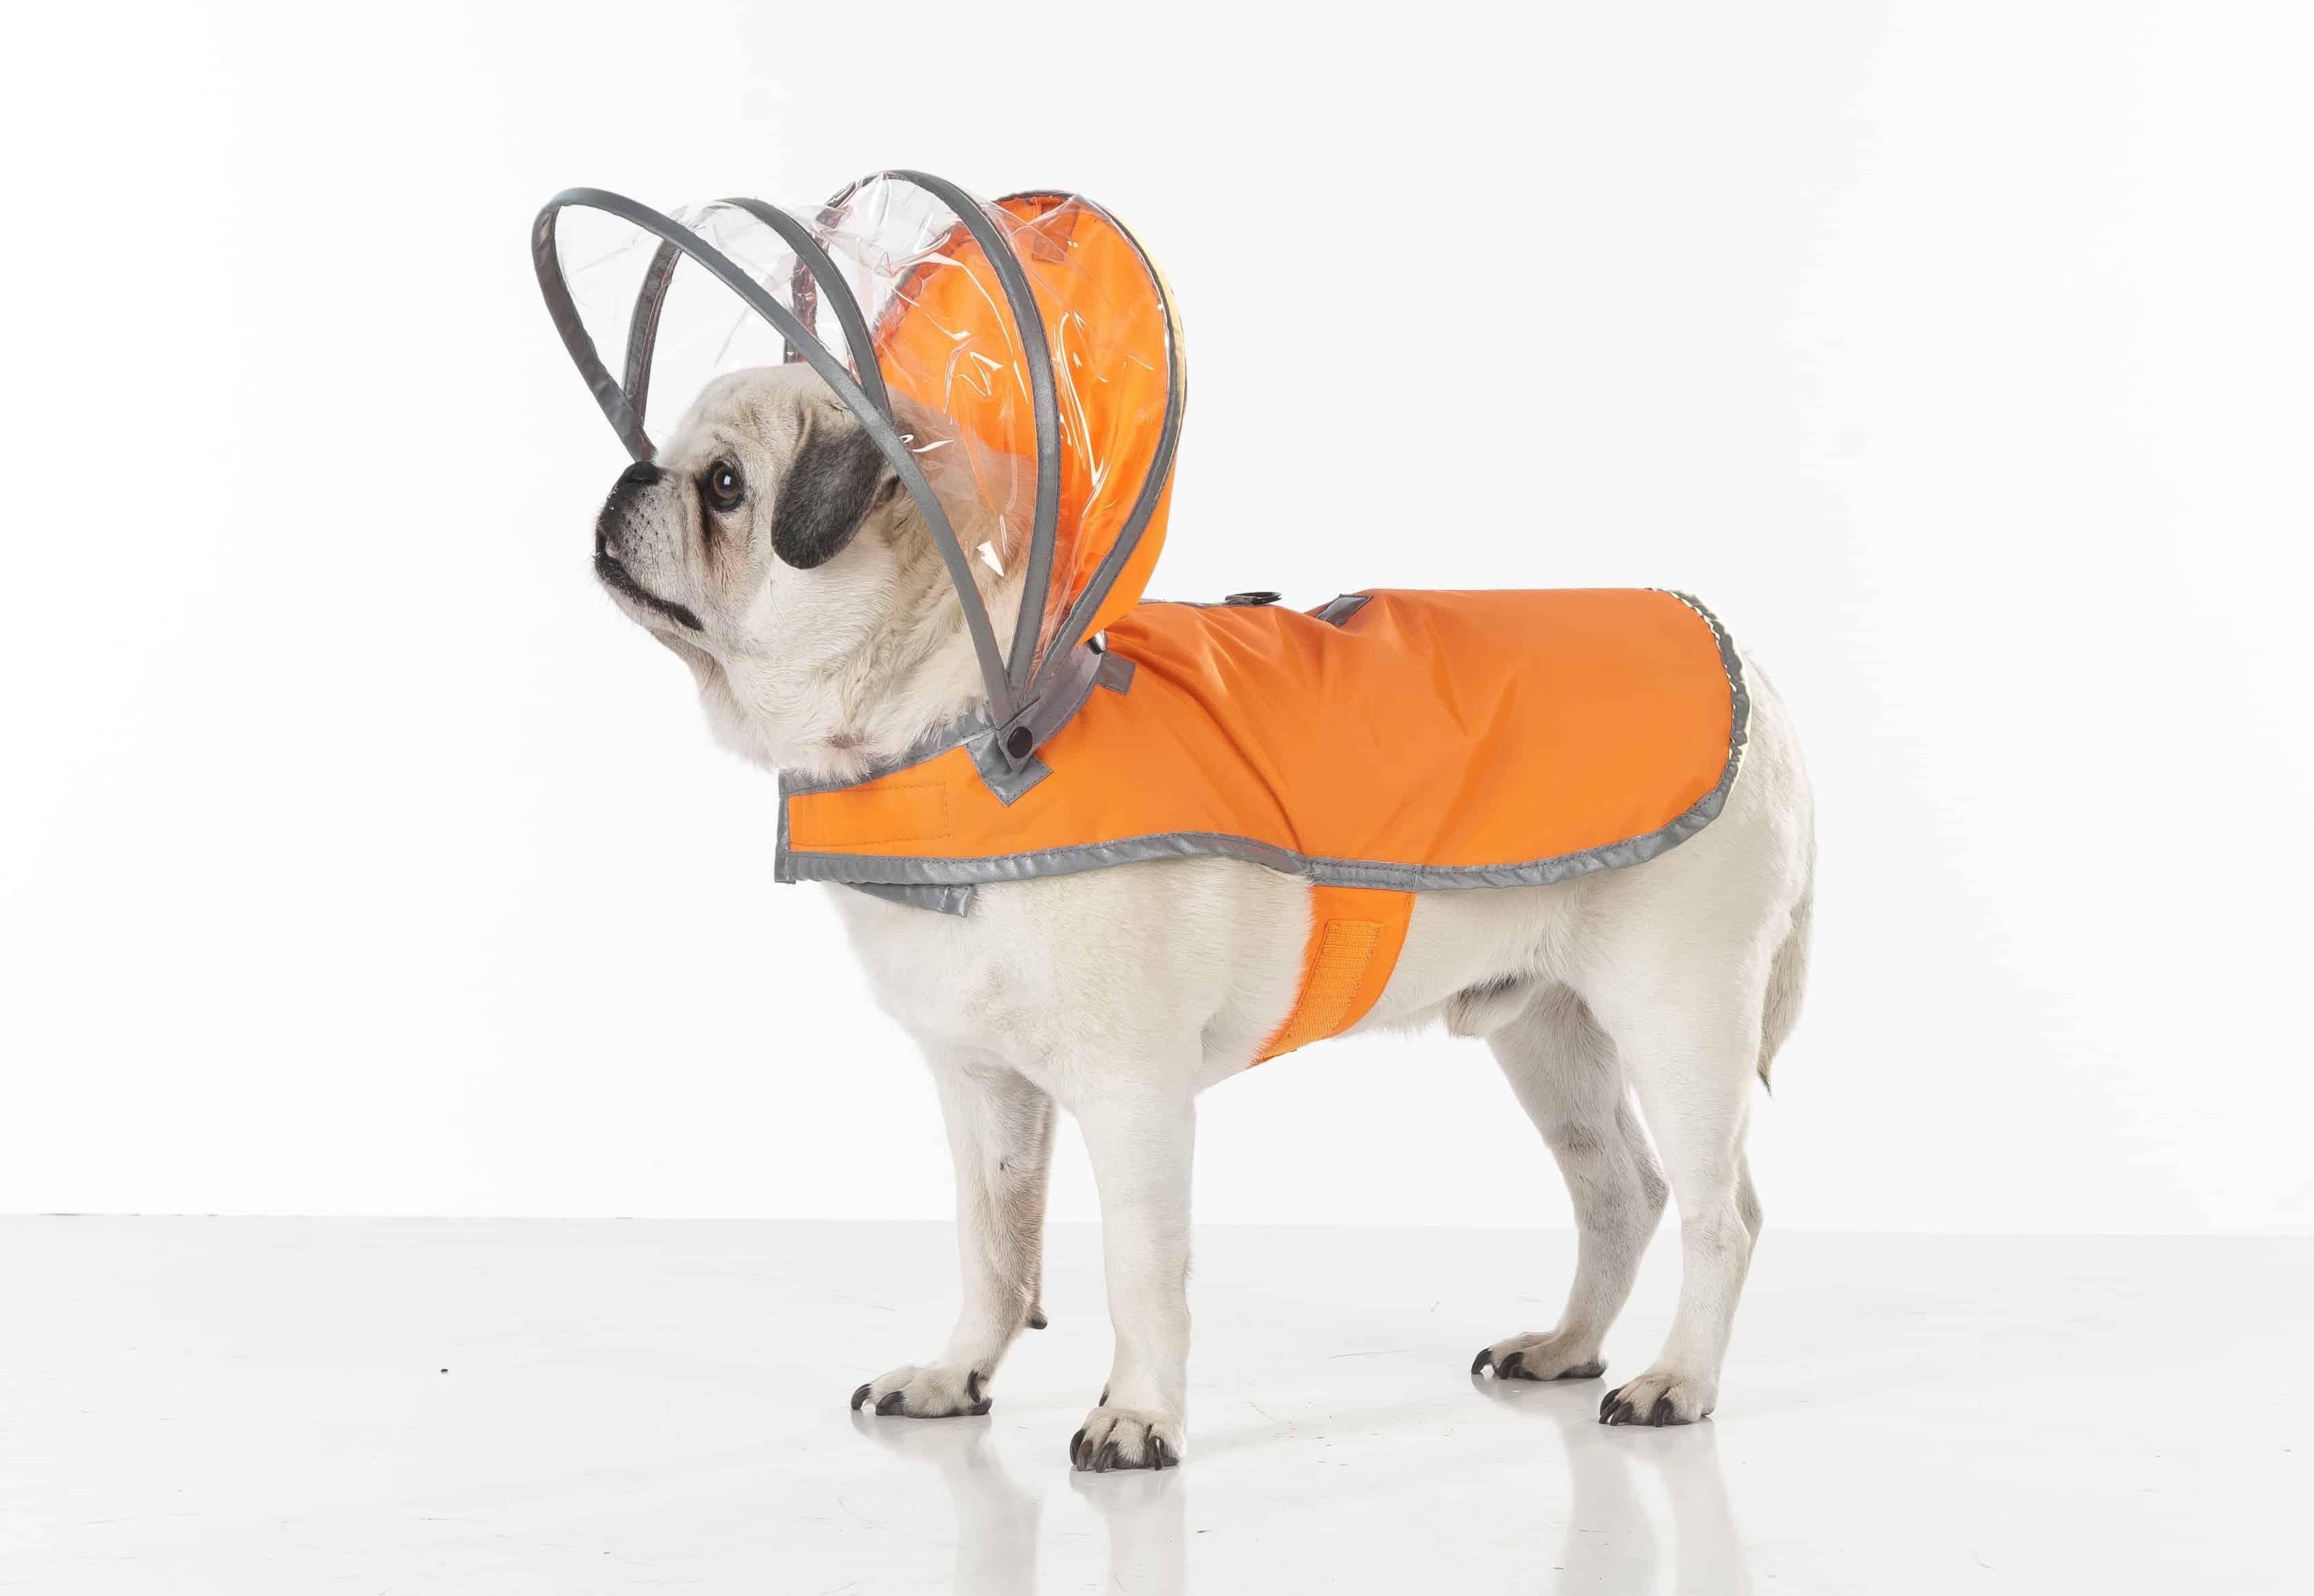 Push Pushi Rainbow Dog Raincoat Doglover Gift Reto Futuristic Bright Bright Orange